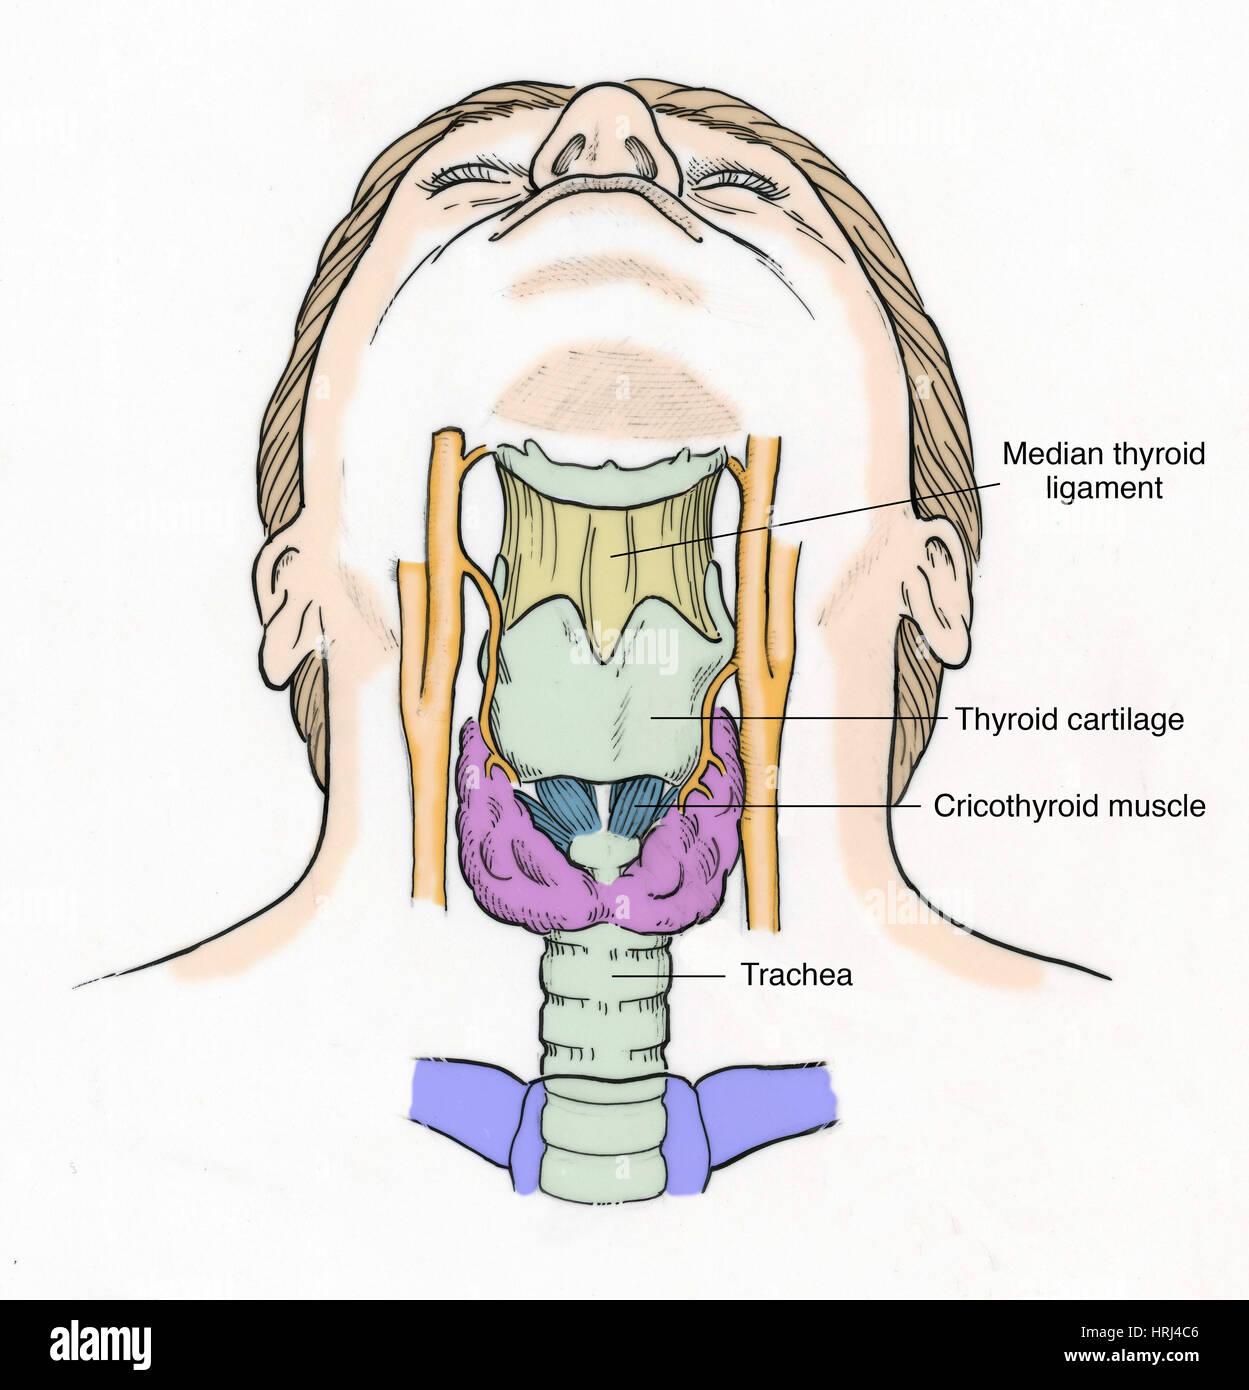 Illustration of Throat Anatomy Stock Photo: 135008278 - Alamy